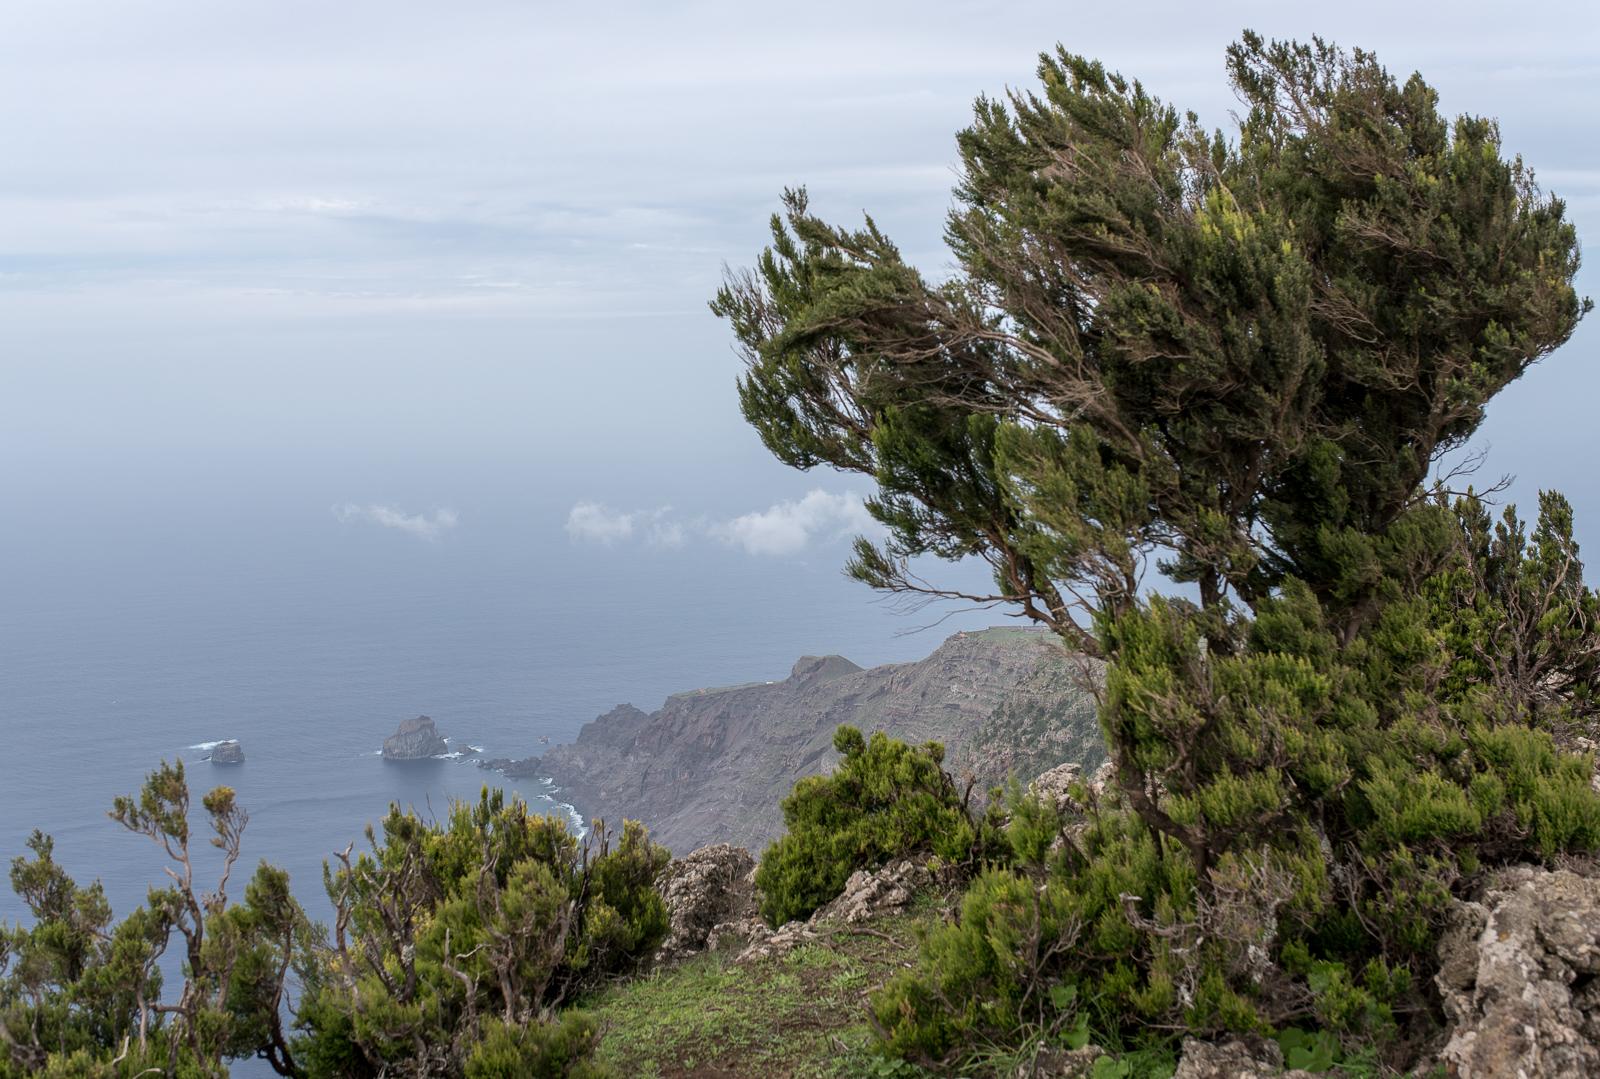 Blick auf die Roques de Salmor